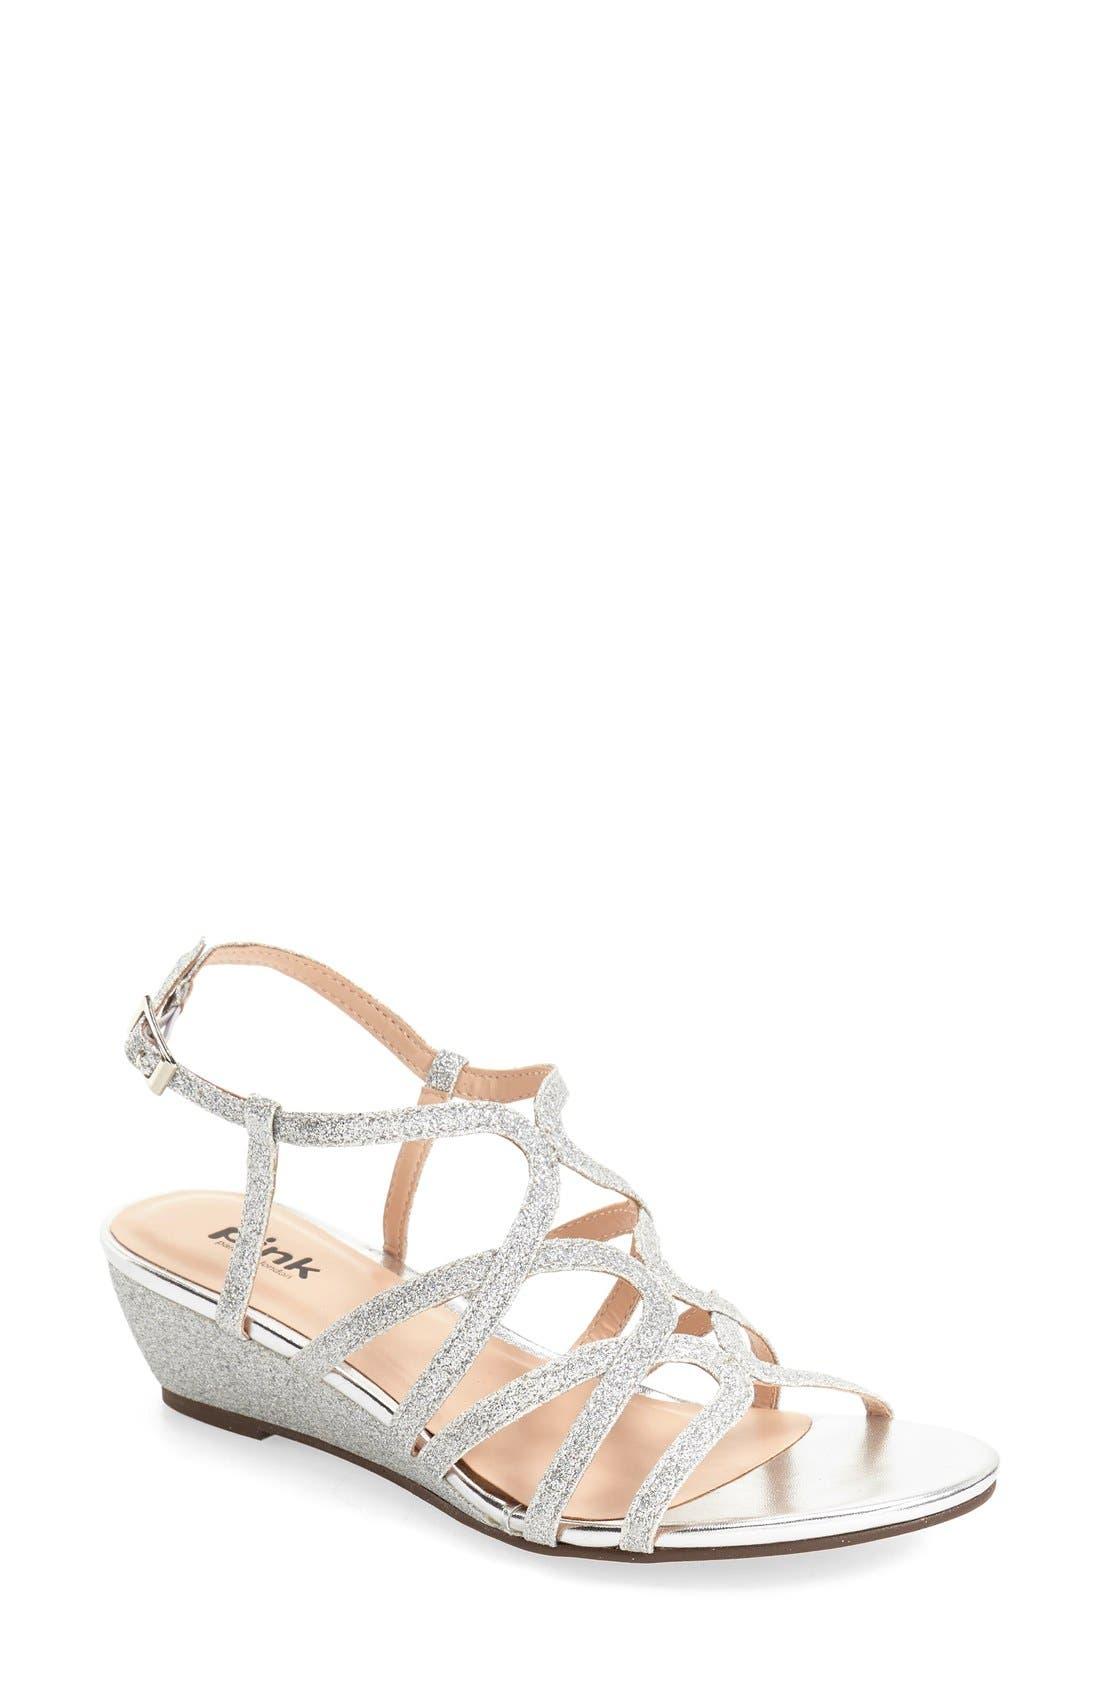 'Opulent' Wedge Sandal,                             Main thumbnail 1, color,                             040